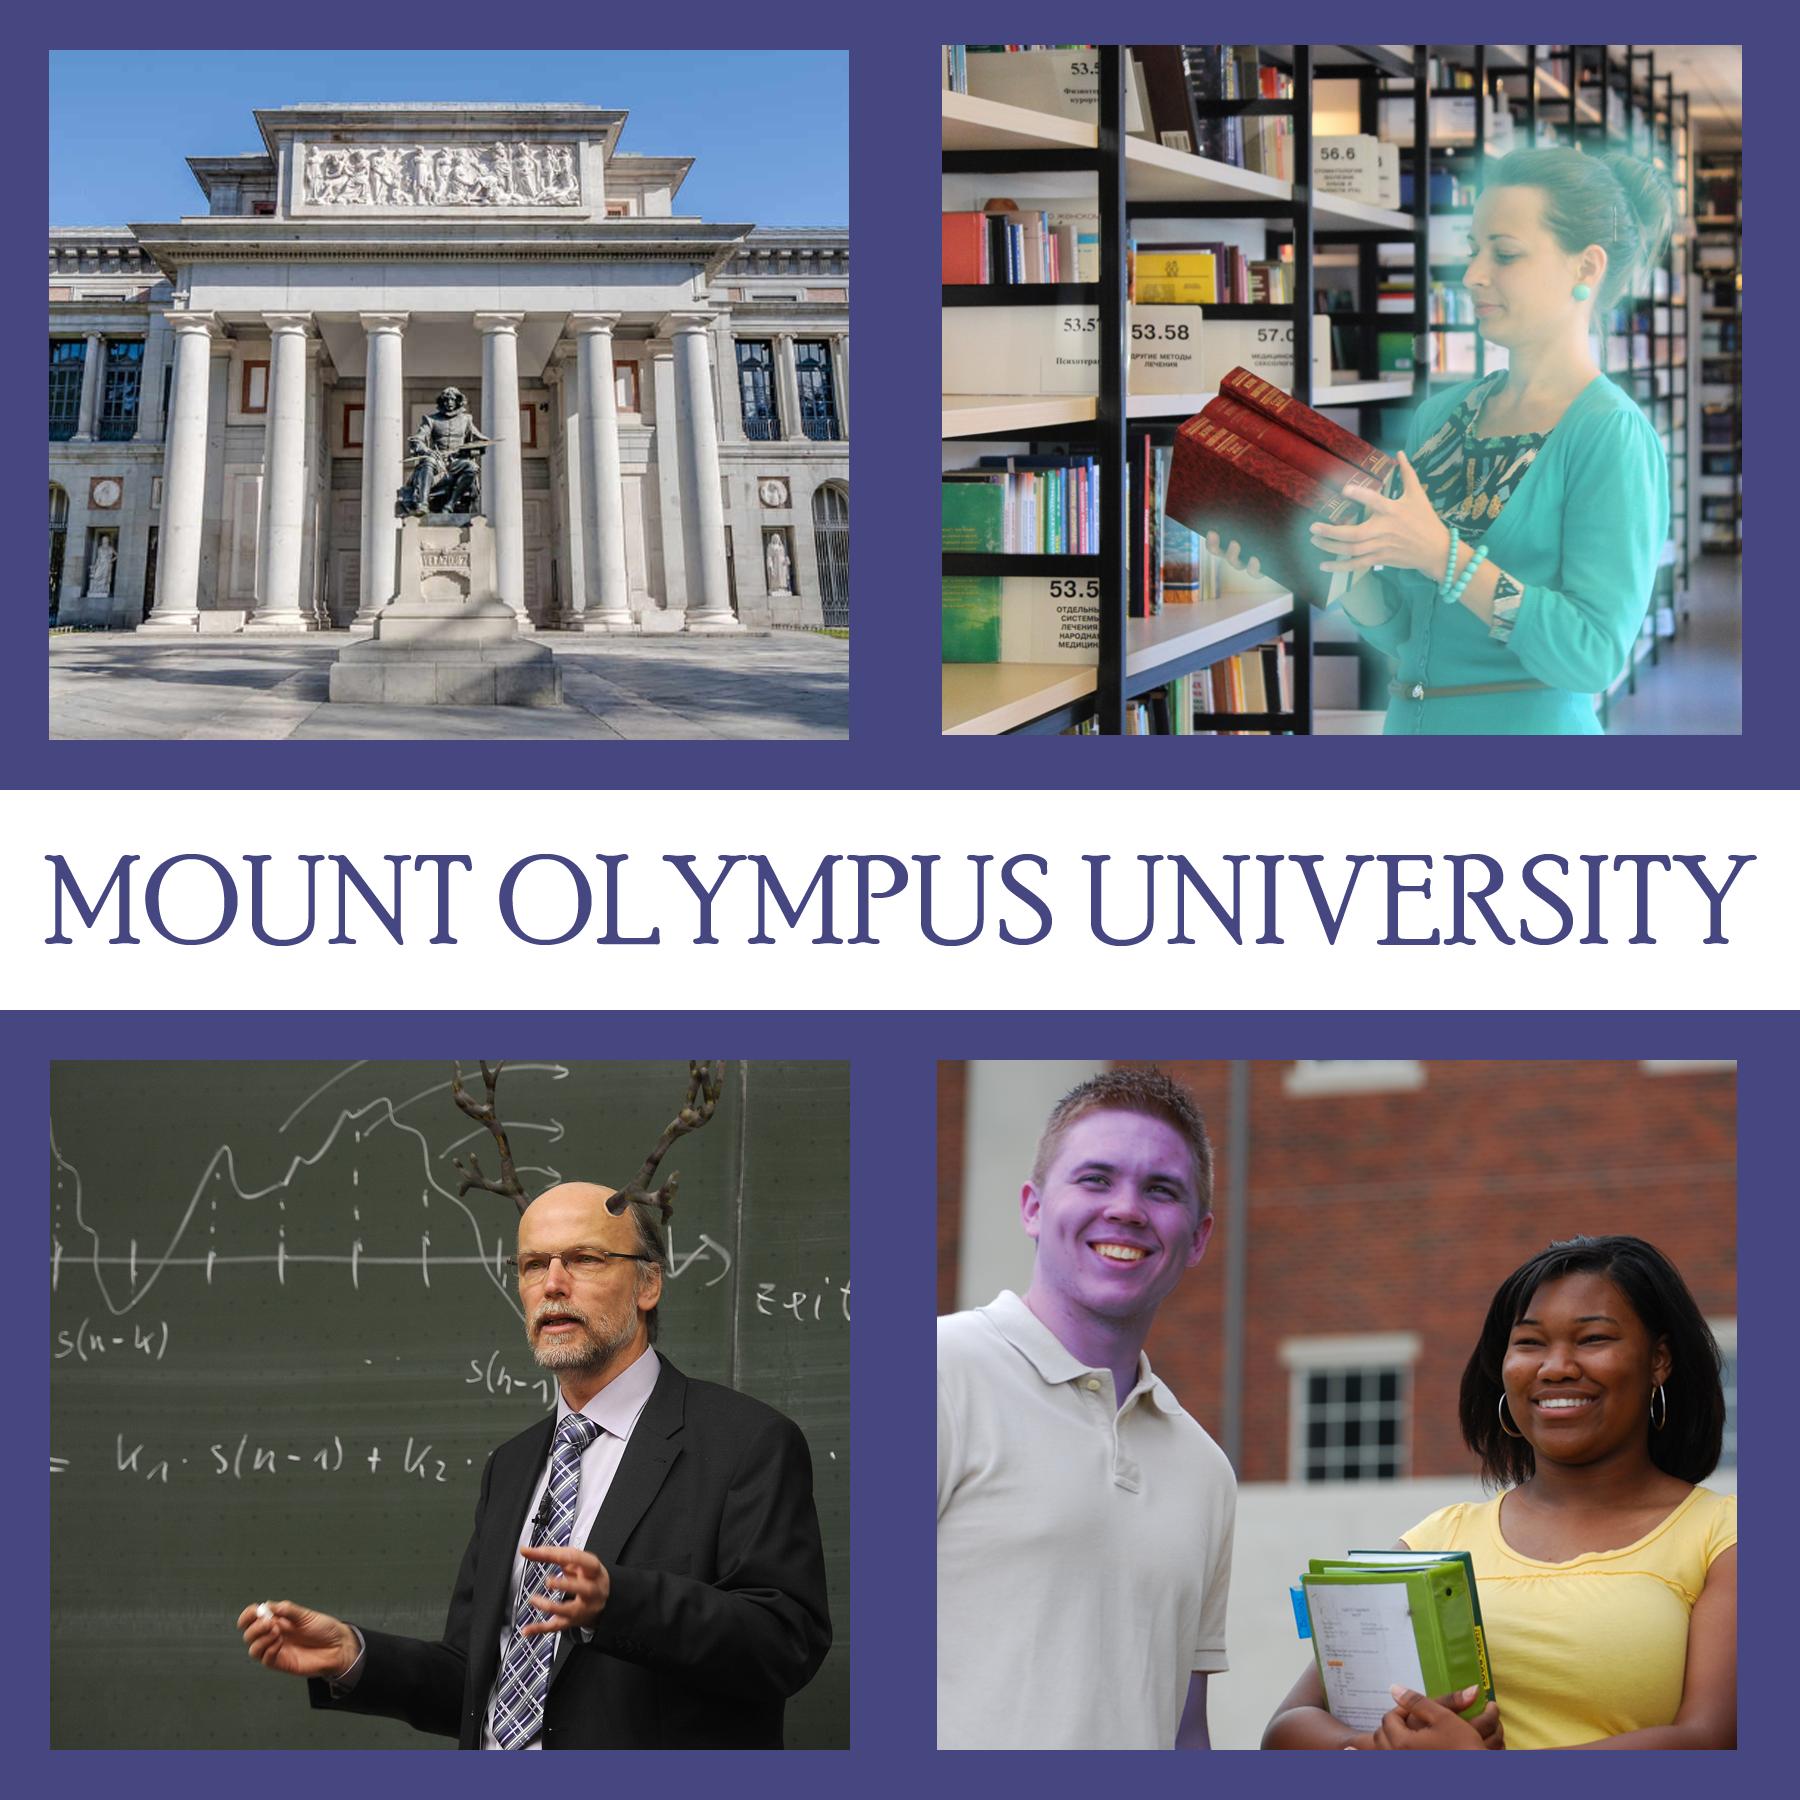 Mount Olympus University show art